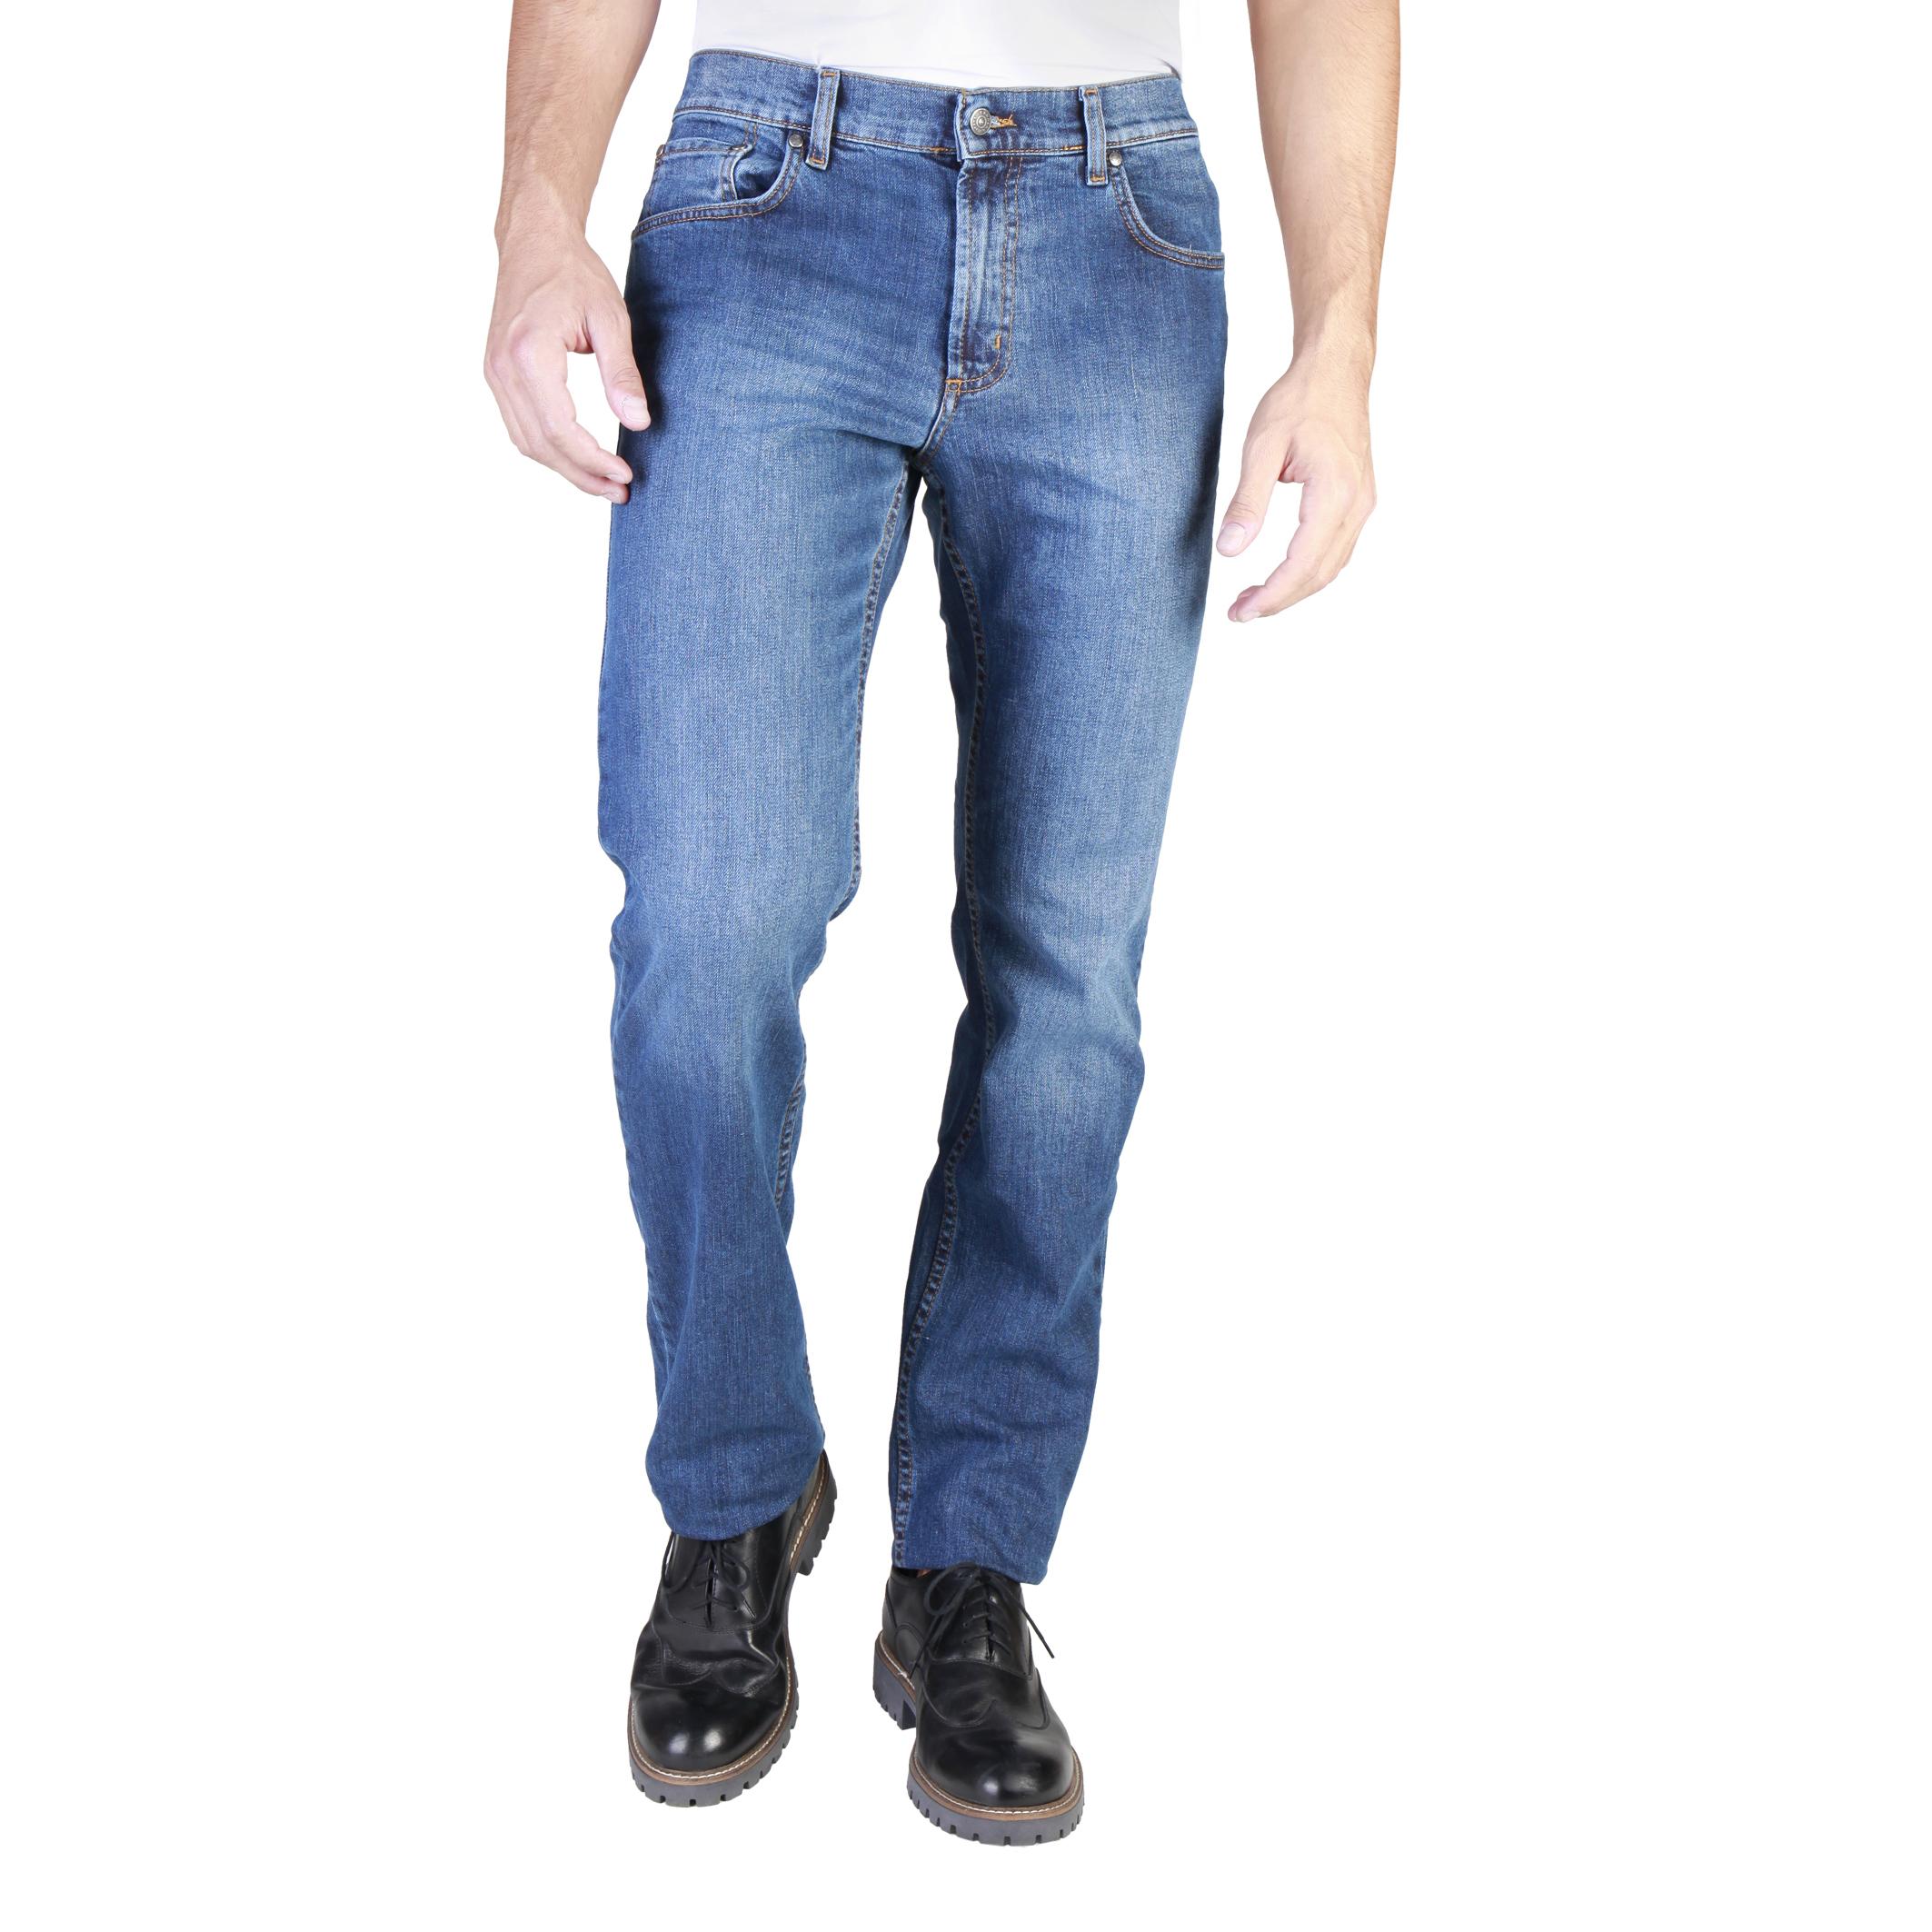 Jeans Carrera Jeans 000700_0921S Uomo Blu 85303